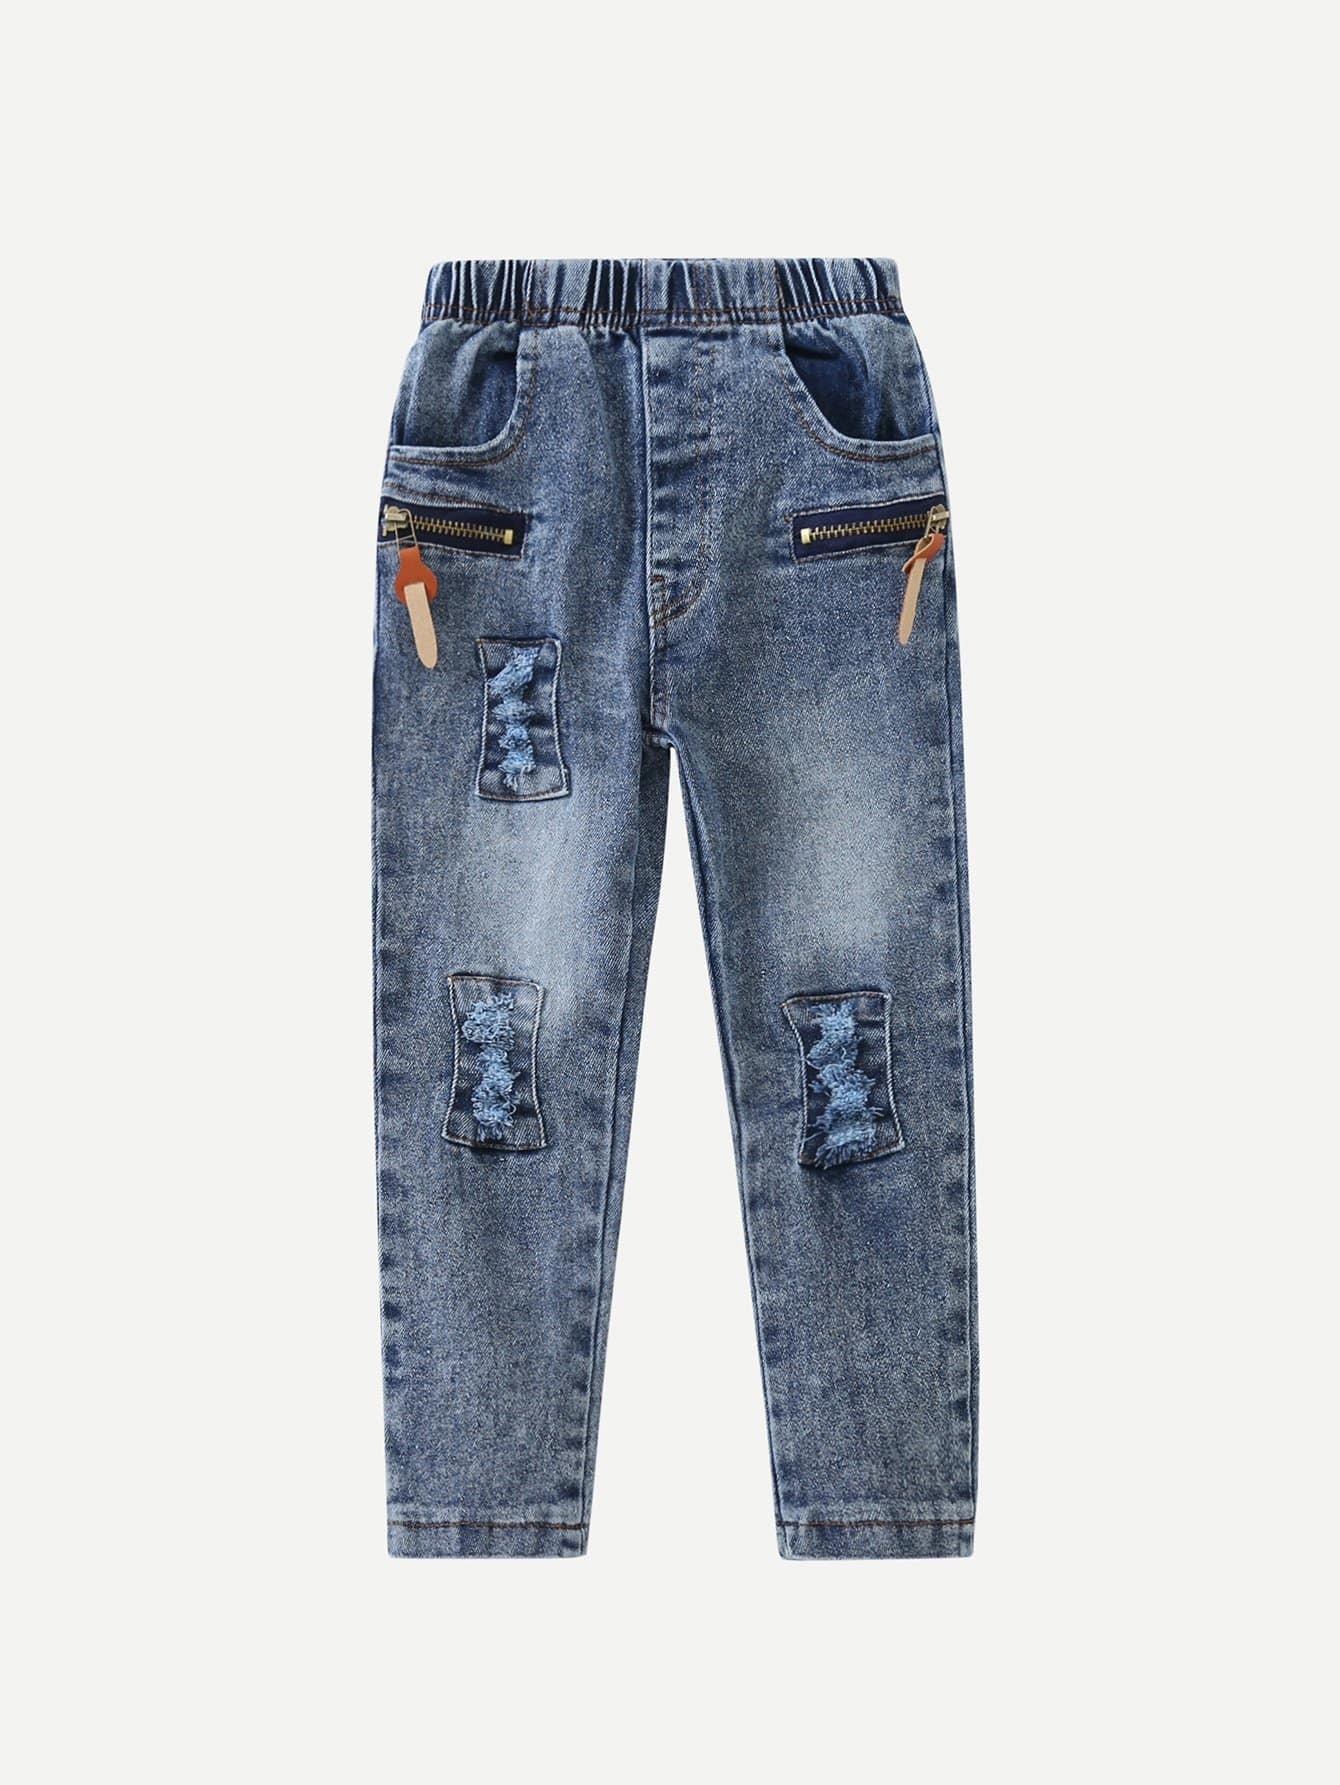 Boys Zip Decoration Destroyed Jeans цена 2017